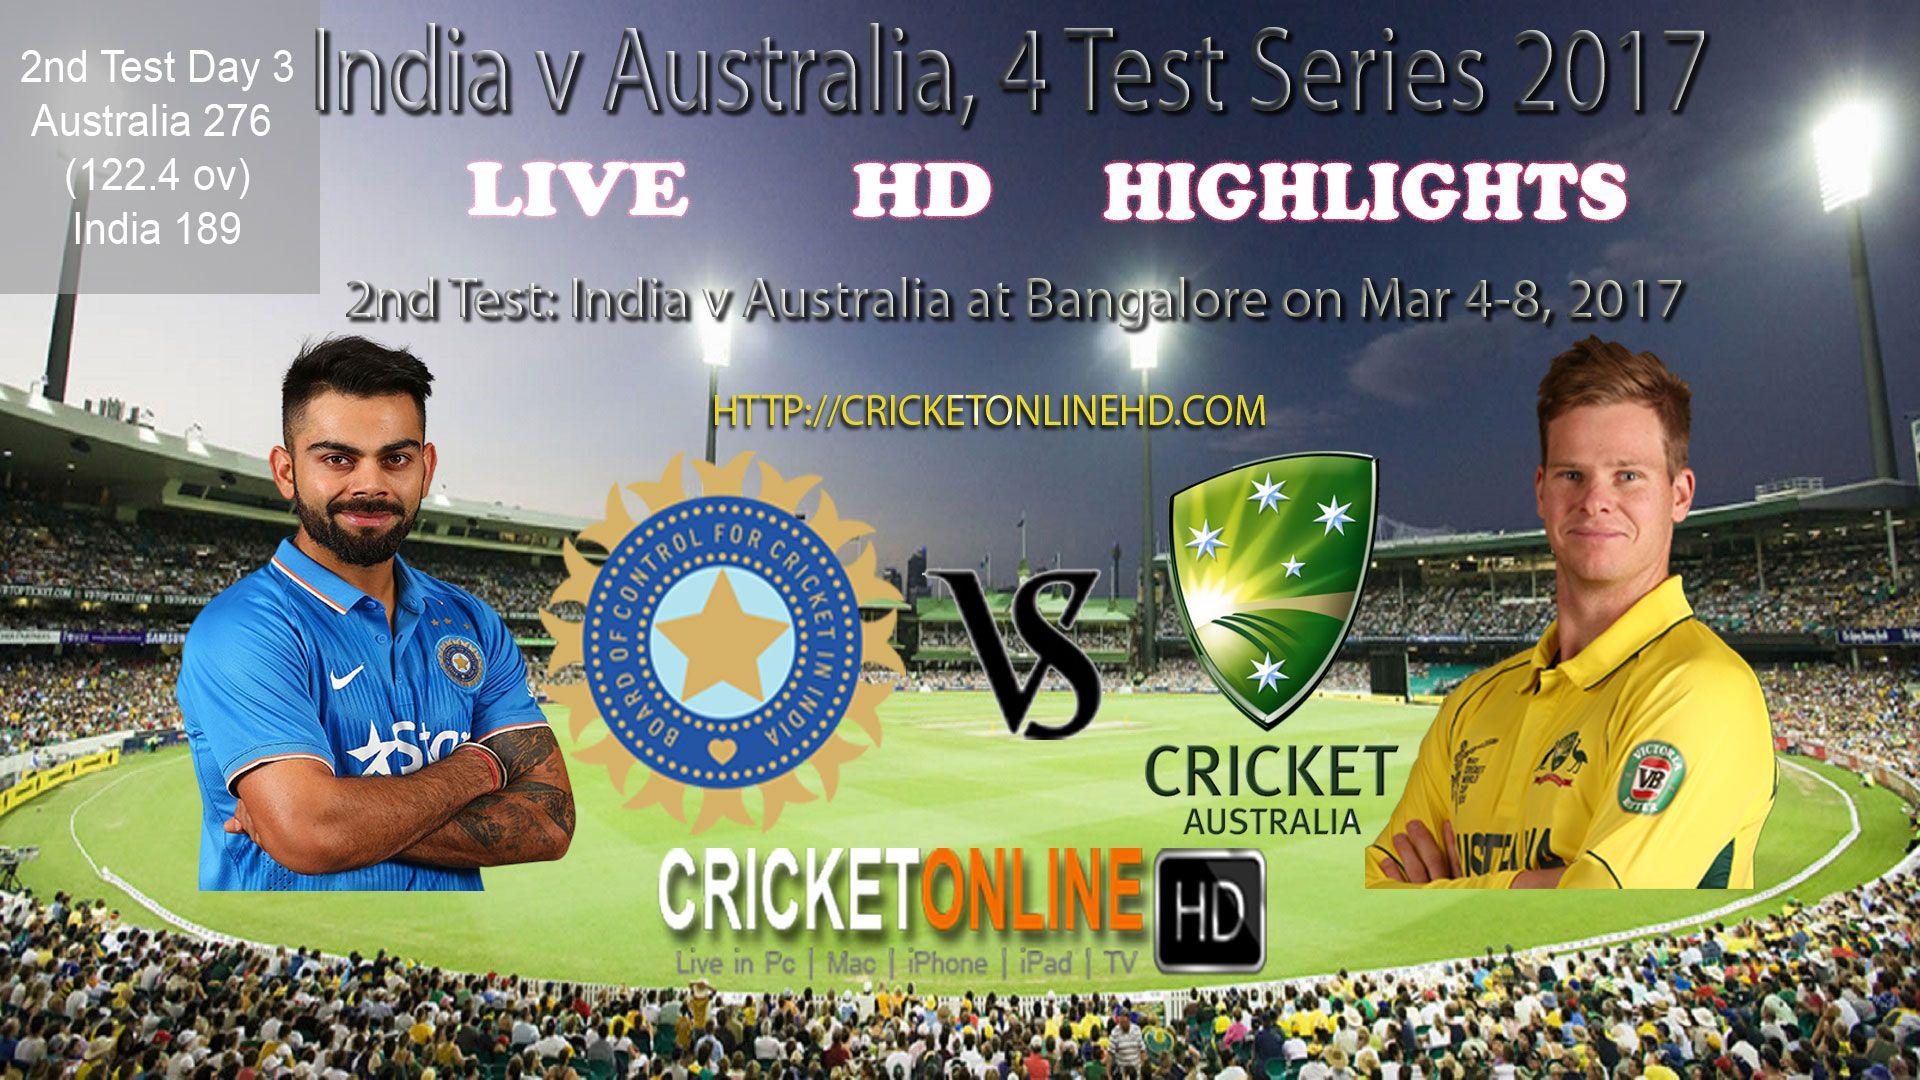 IndVsAus 2nd Test at Bengaluru Day 3, India 189 & 7/0 (1